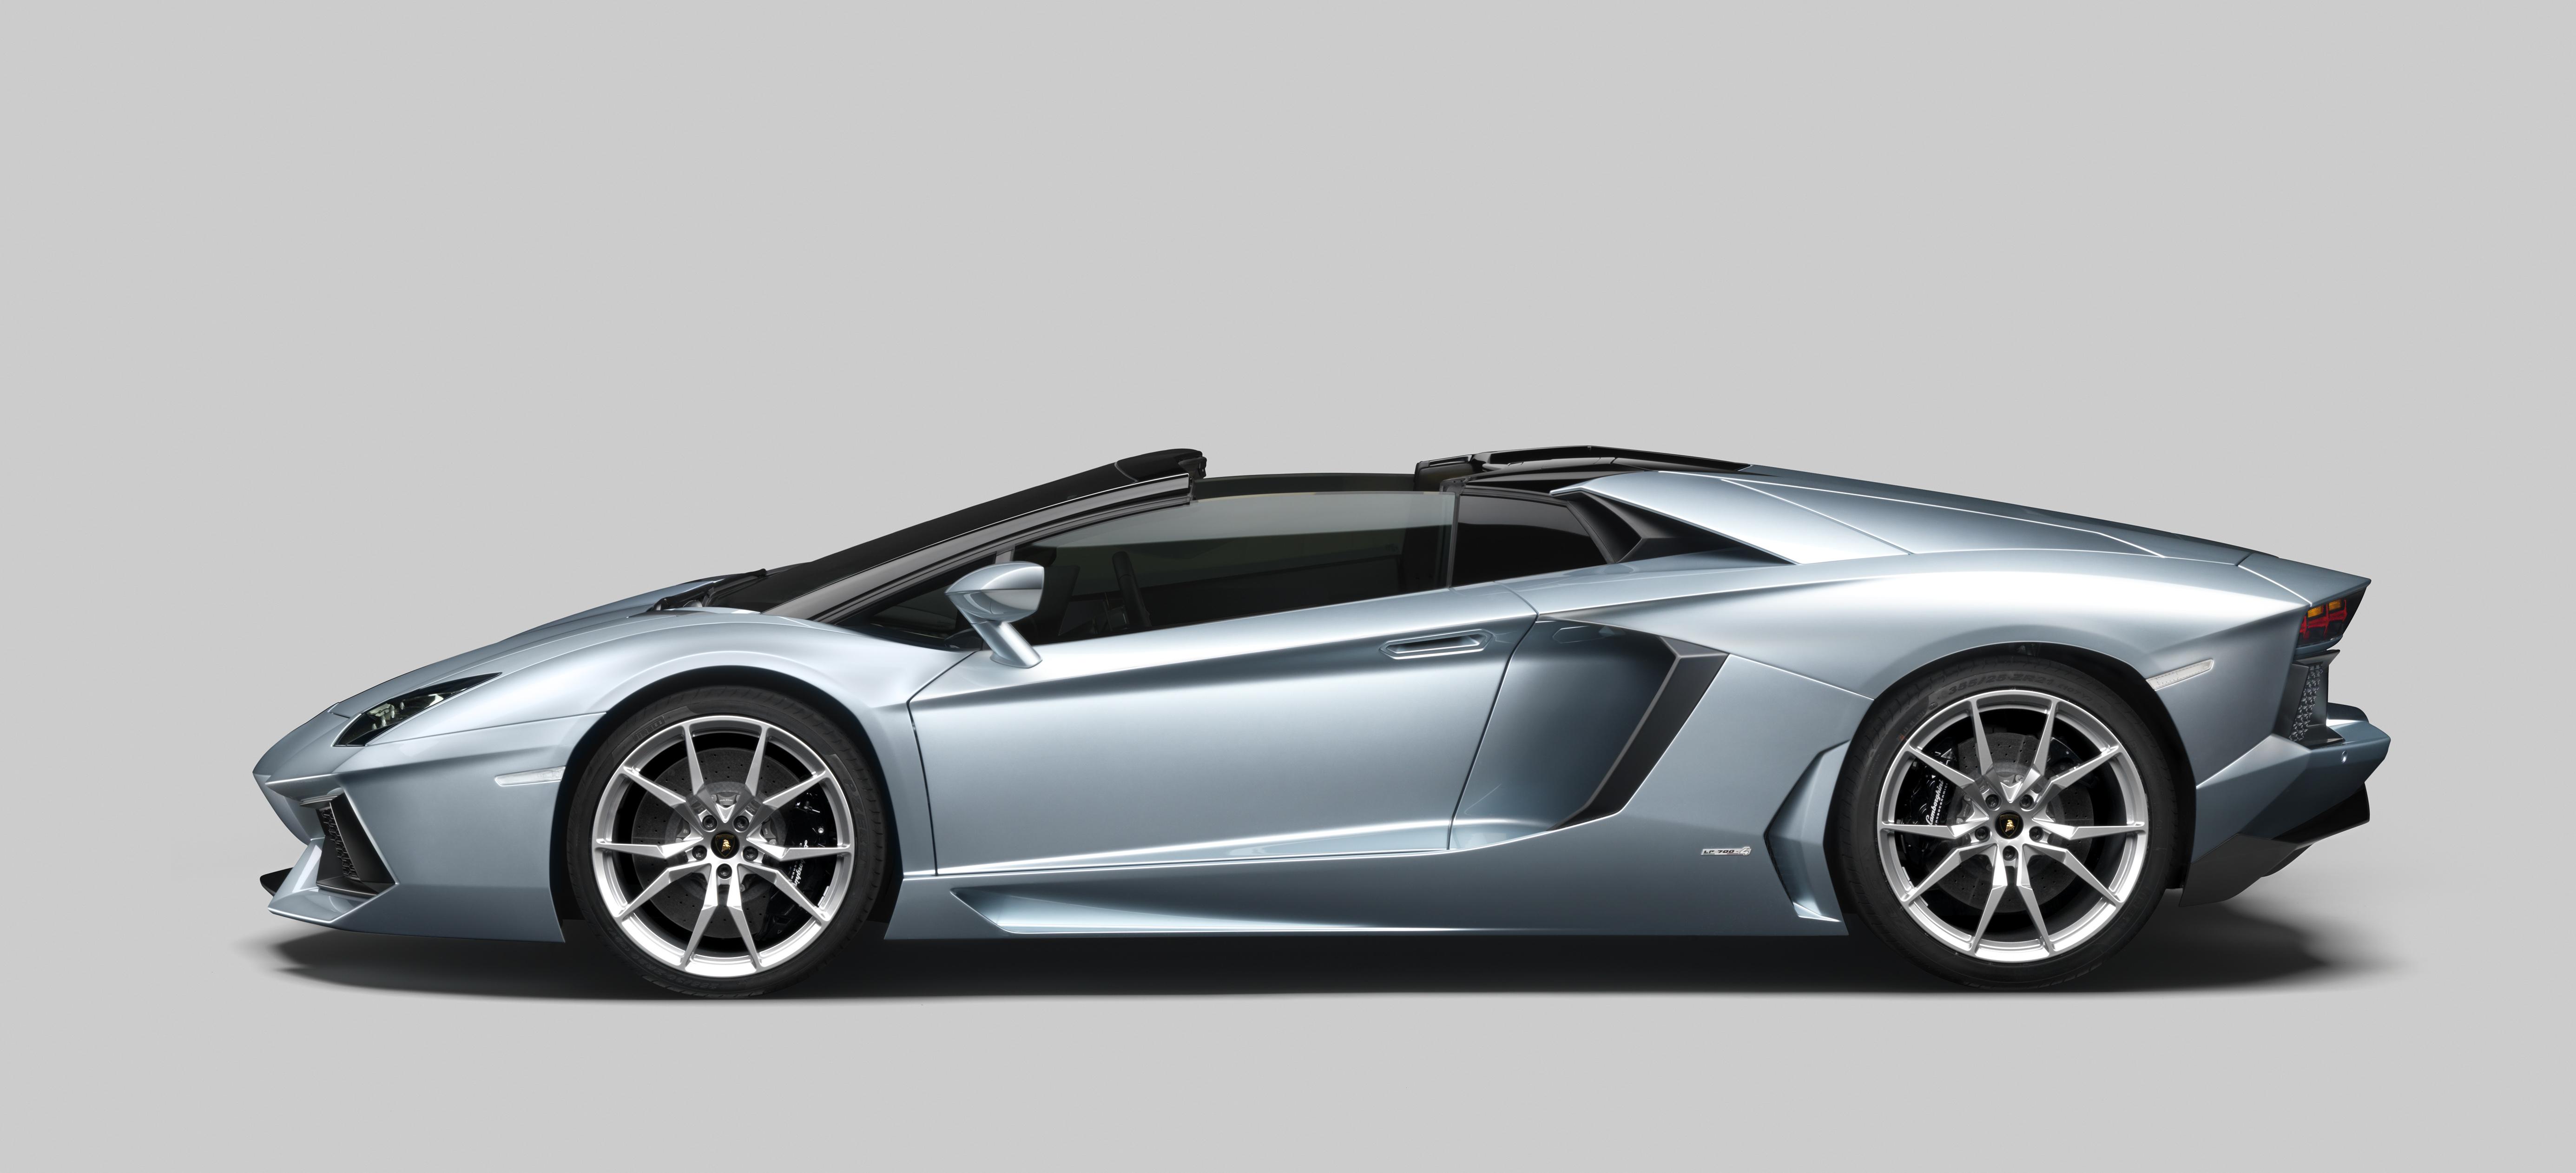 Lamborghini clipart lambo Pictures Side 5543x2523 Canyon View